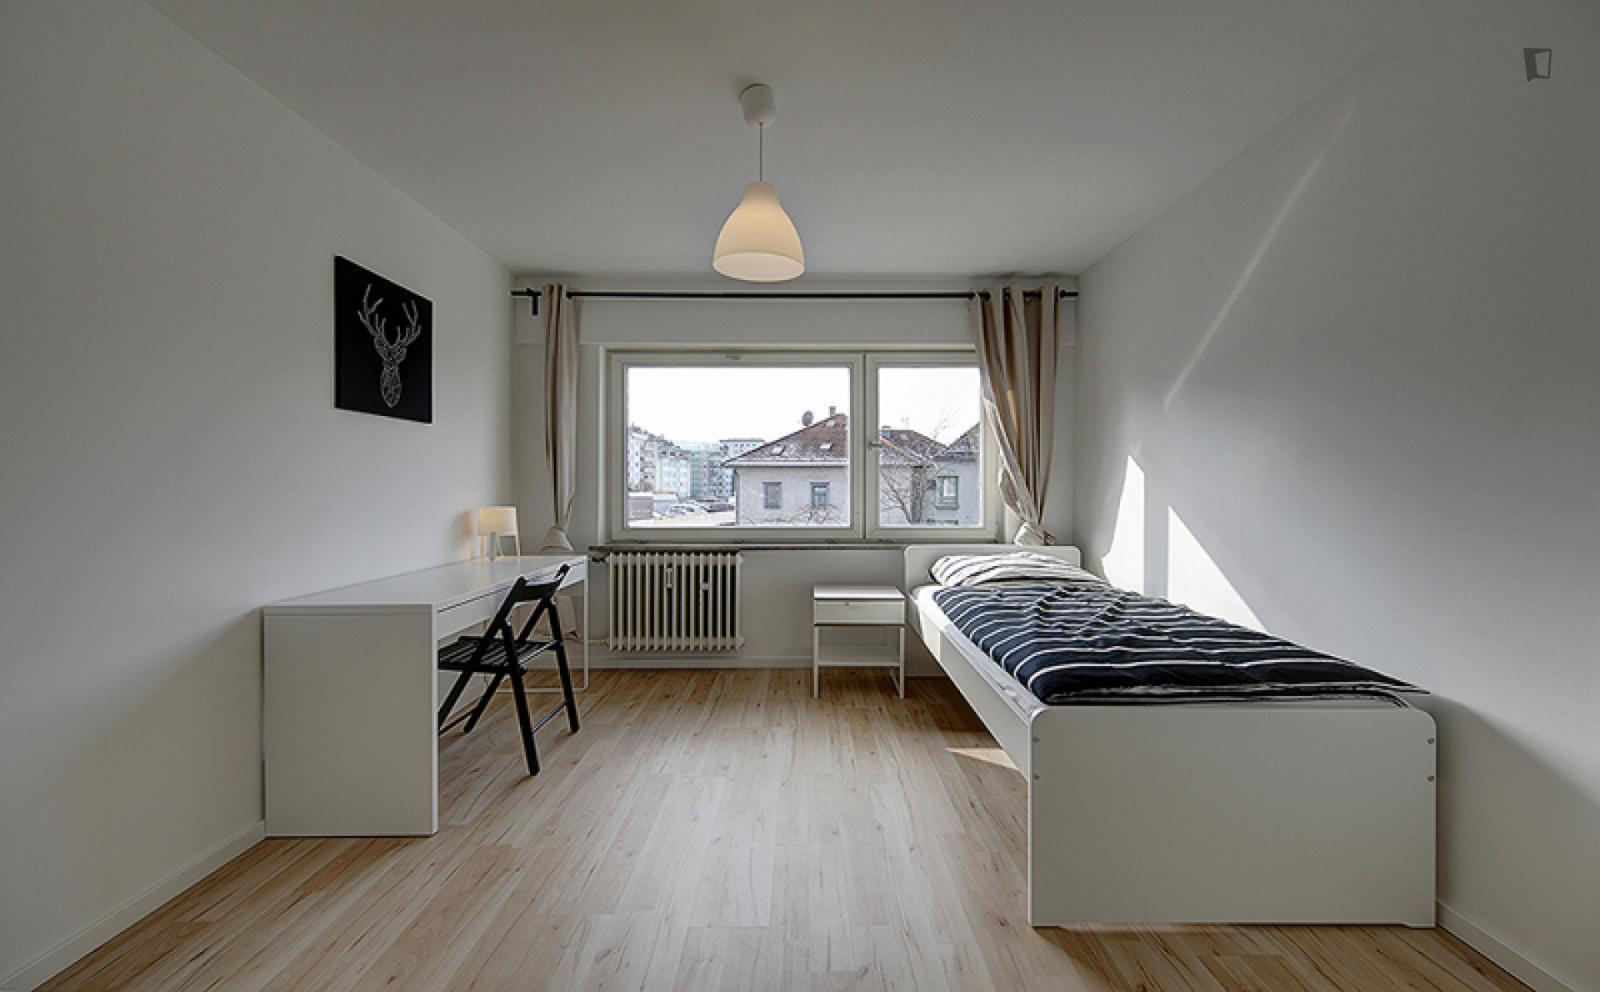 Charlottenstraße - 669EUR / month